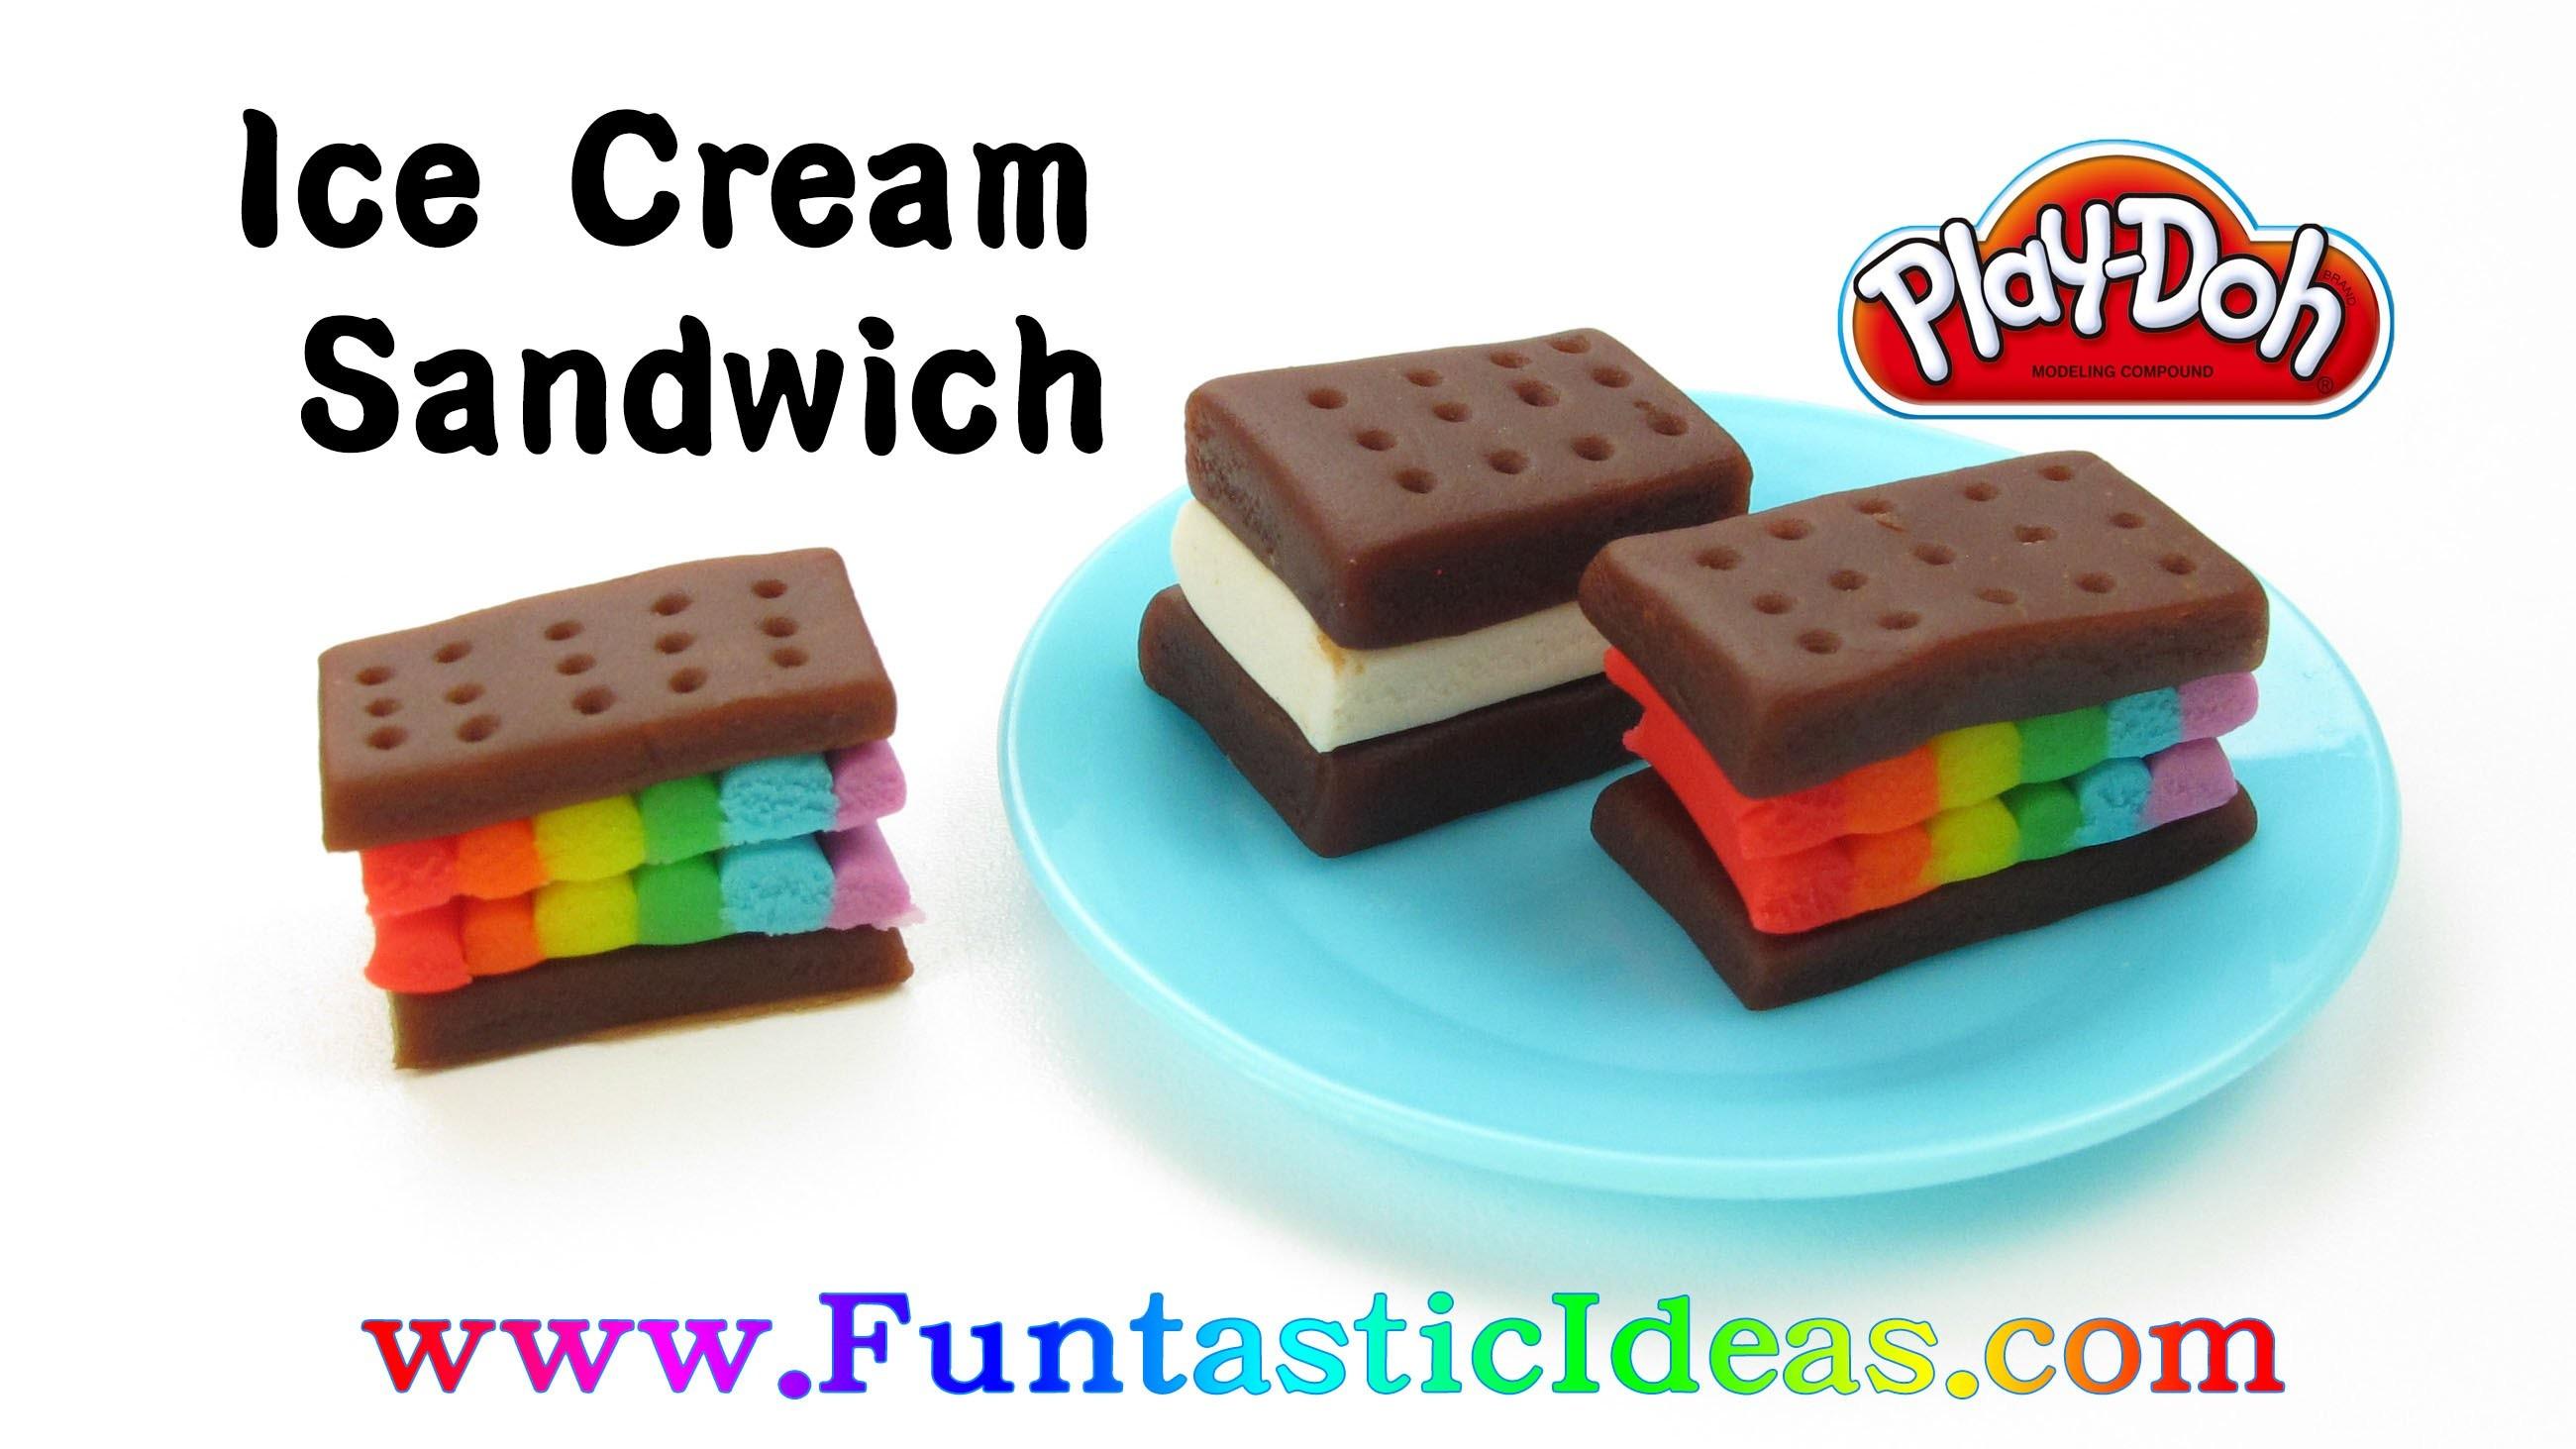 Play Doh Rainbow Ice Cream Sandwich - How to with playdough.Easy DIY Kids